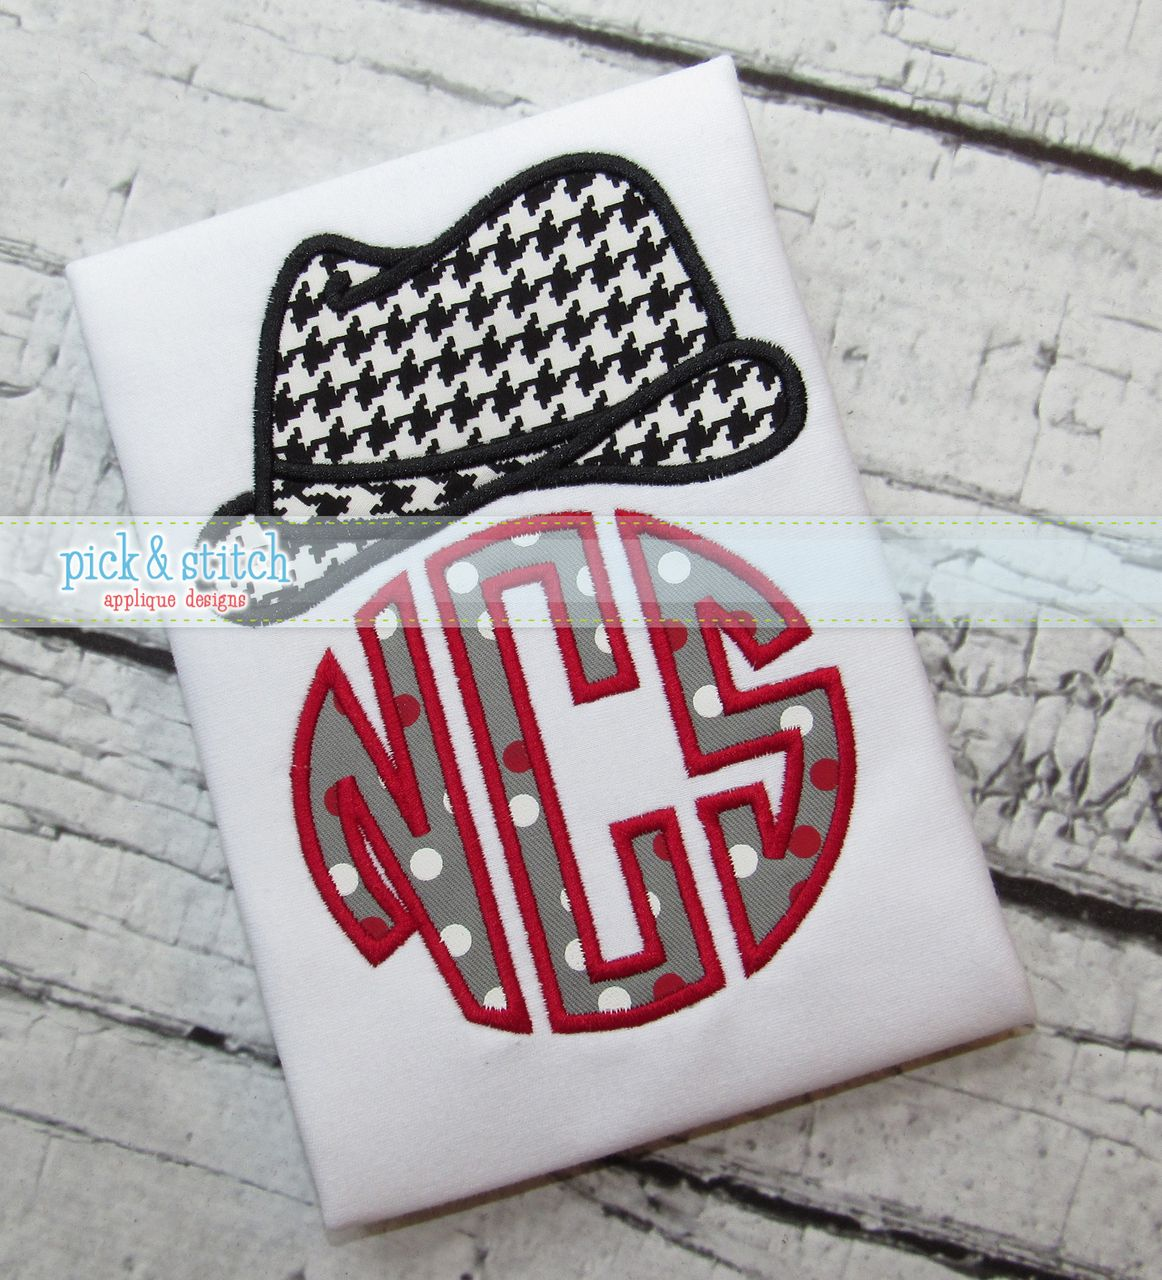 Pin By Pamela Stephens On Secret Embroidery Design Wish List Applique Designs Monogram Embroidery Designs